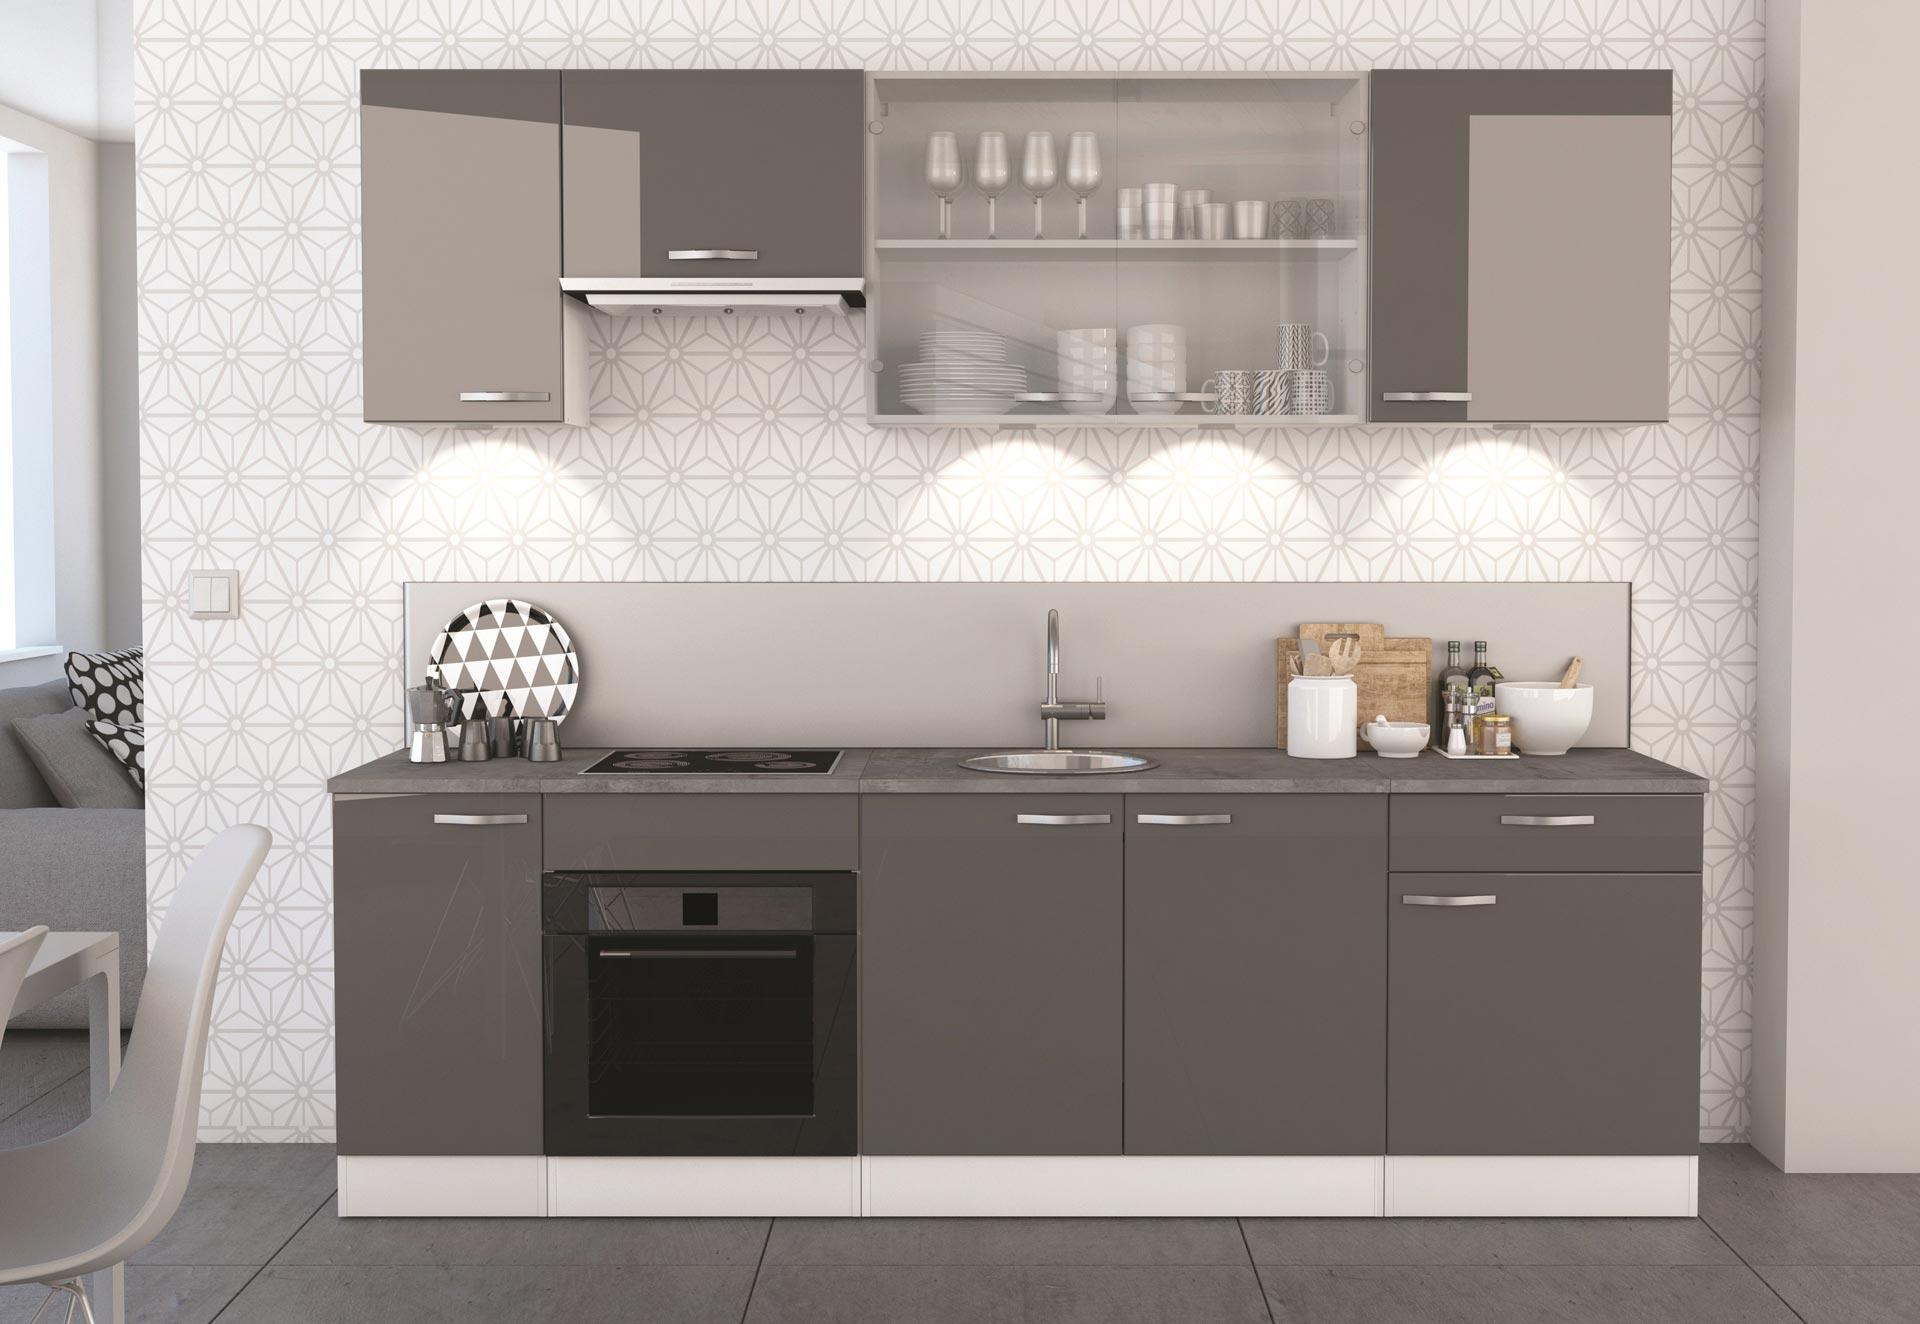 Finest meuble cuisine avec tiroir coulissant meuble for Interieur placard cuisine